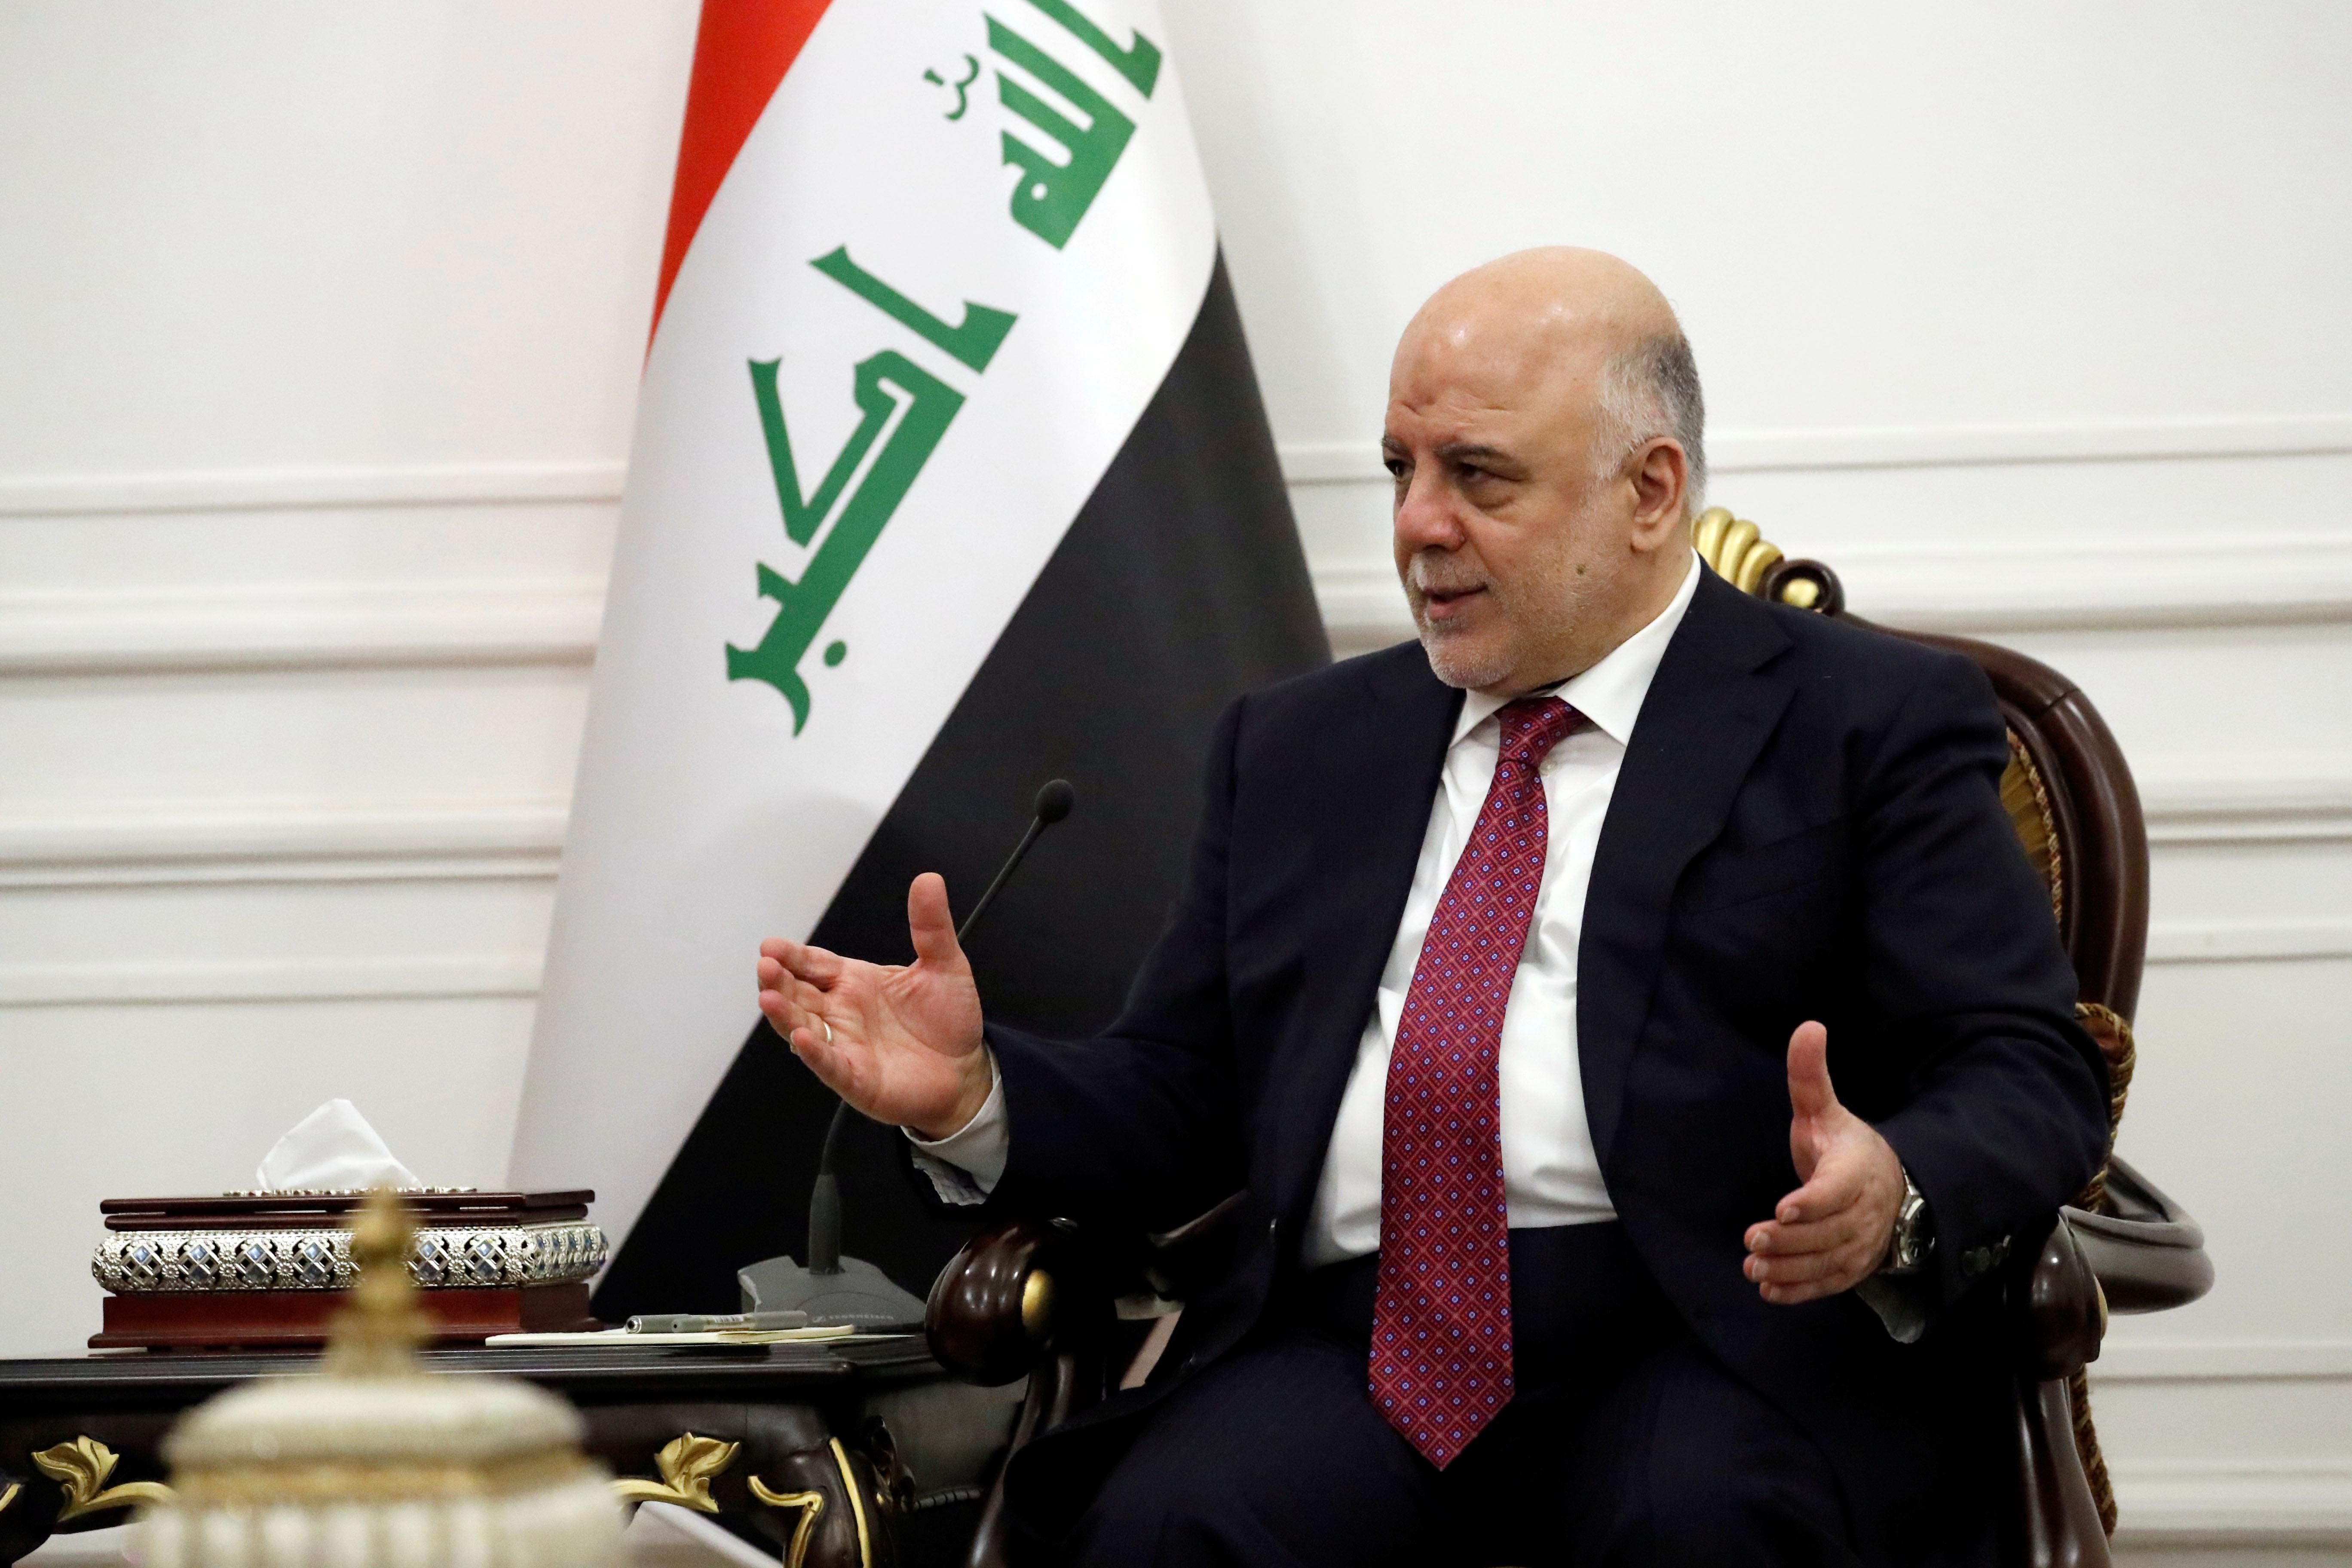 Tillerson speaks with Iraqi Prime Minister Haider al-Abadi in Baghdad